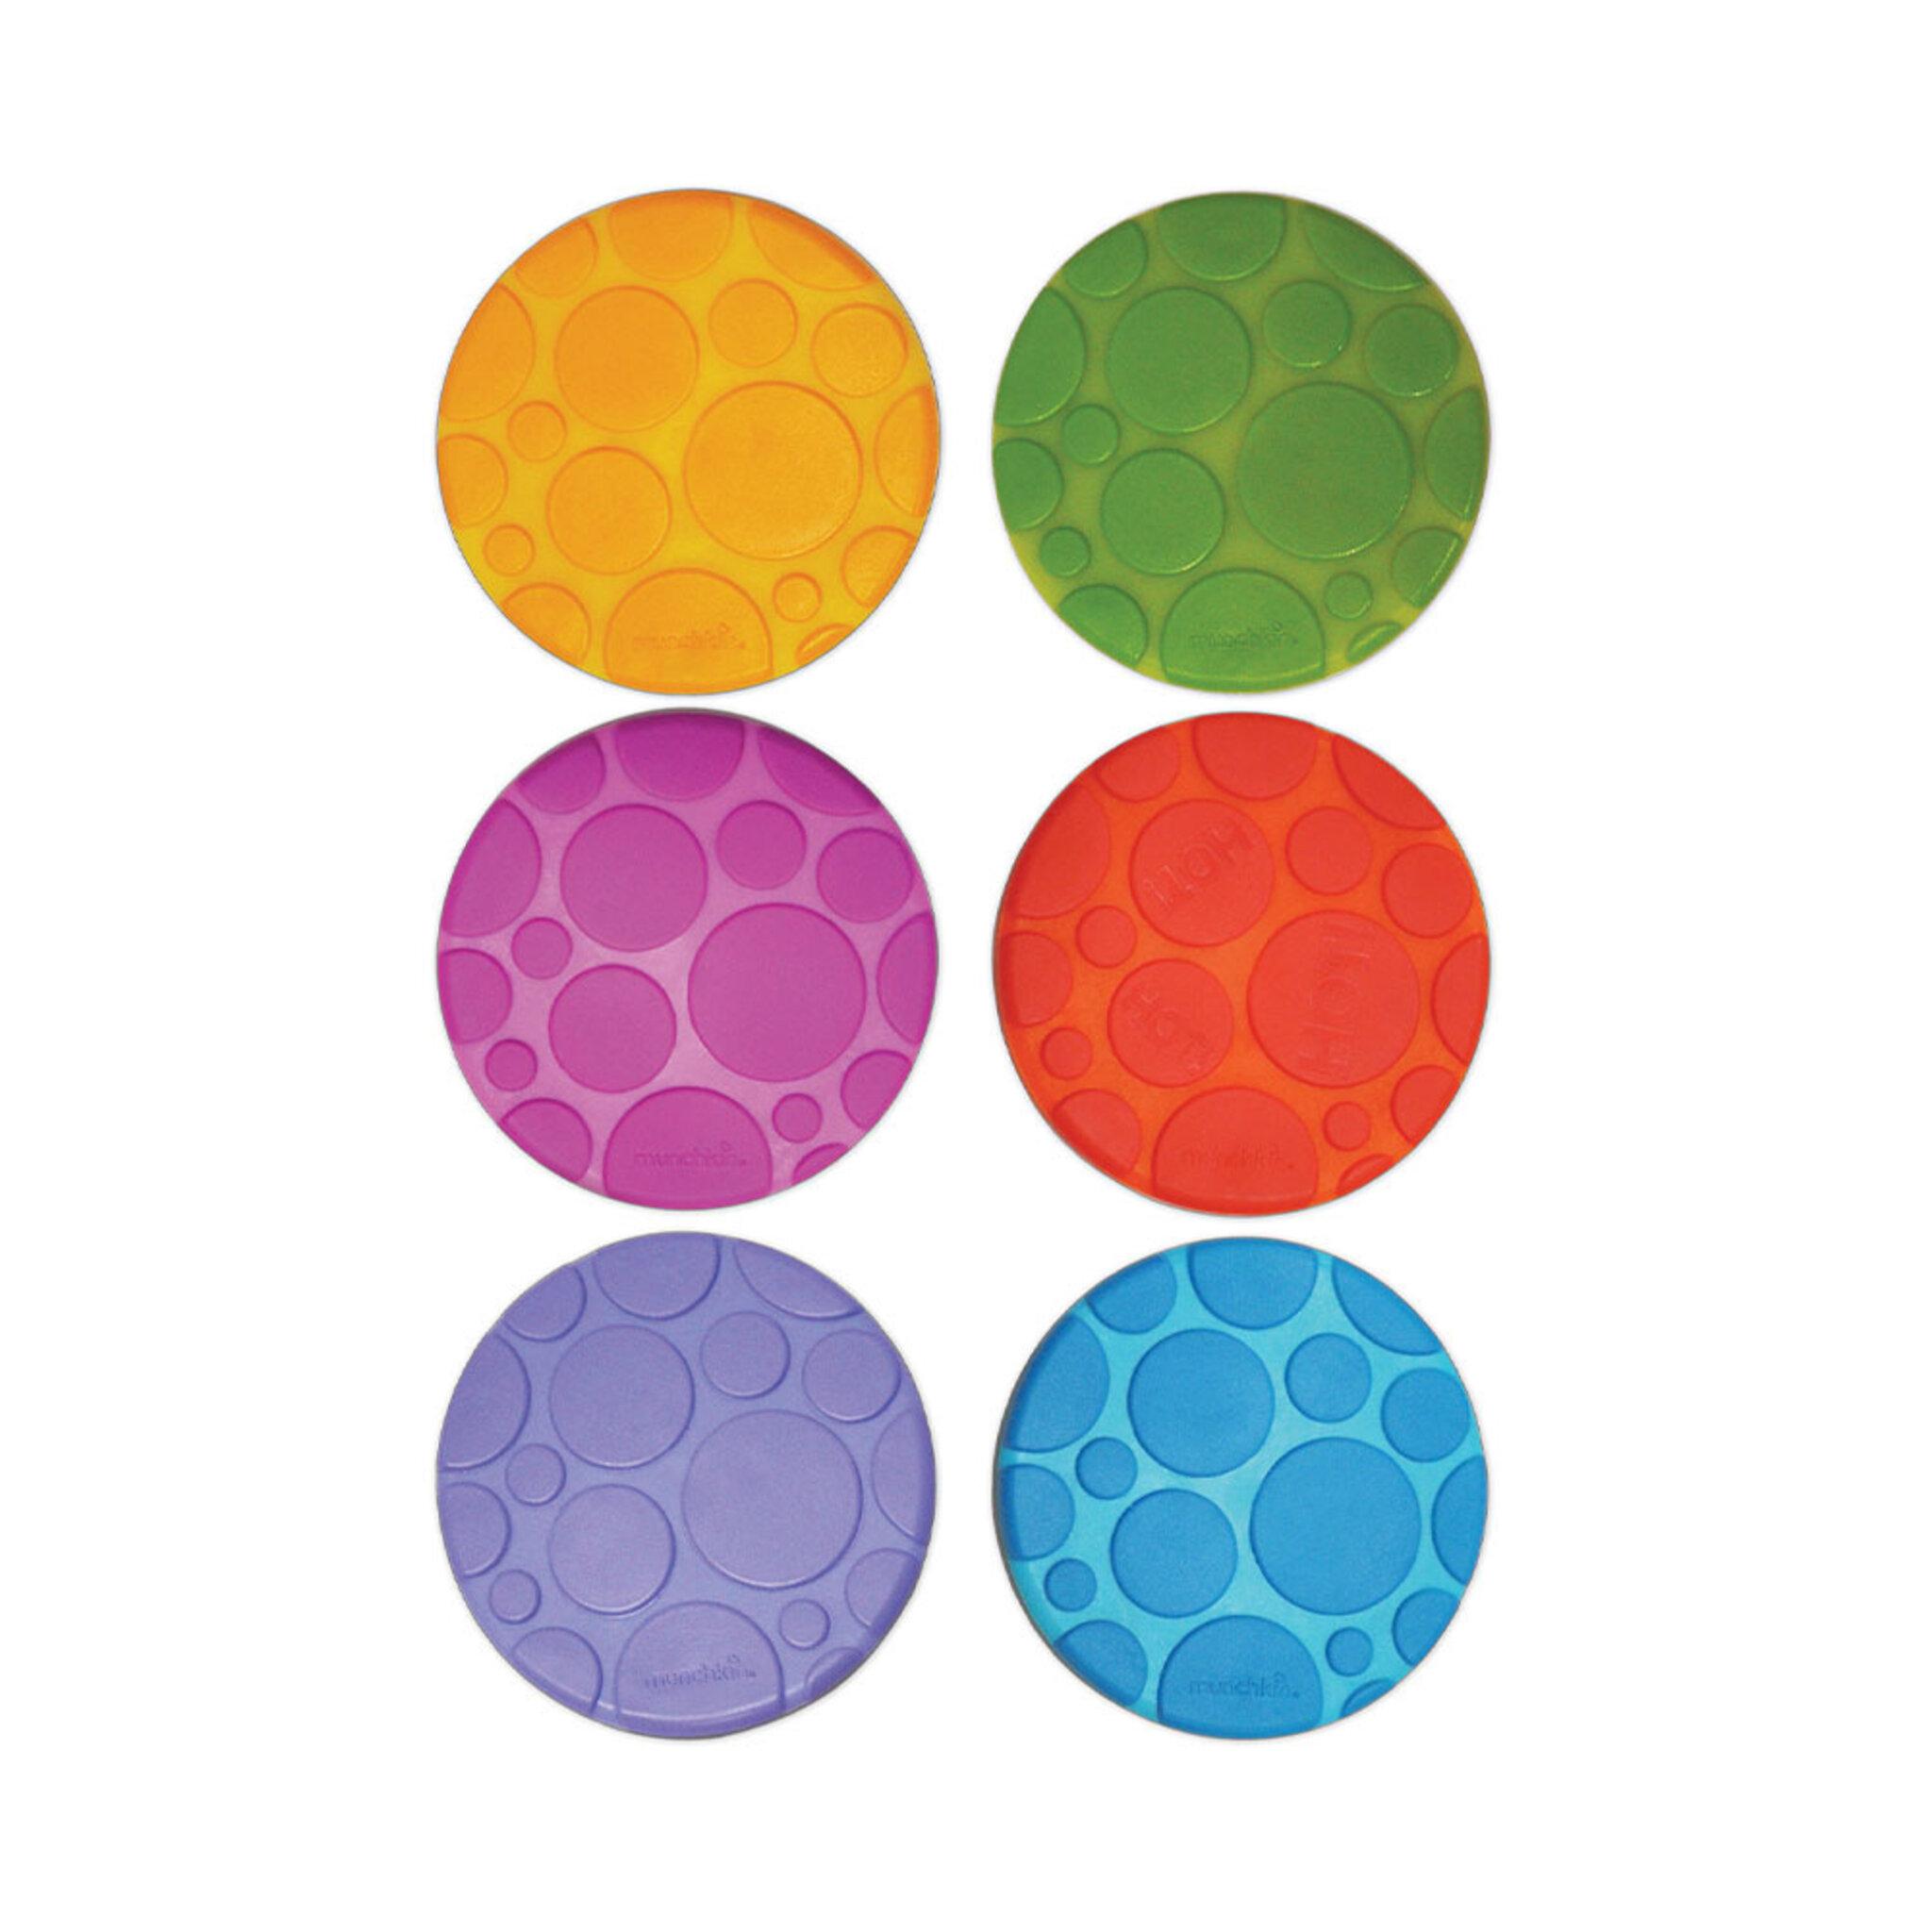 Halkskydd 6 st olika färger